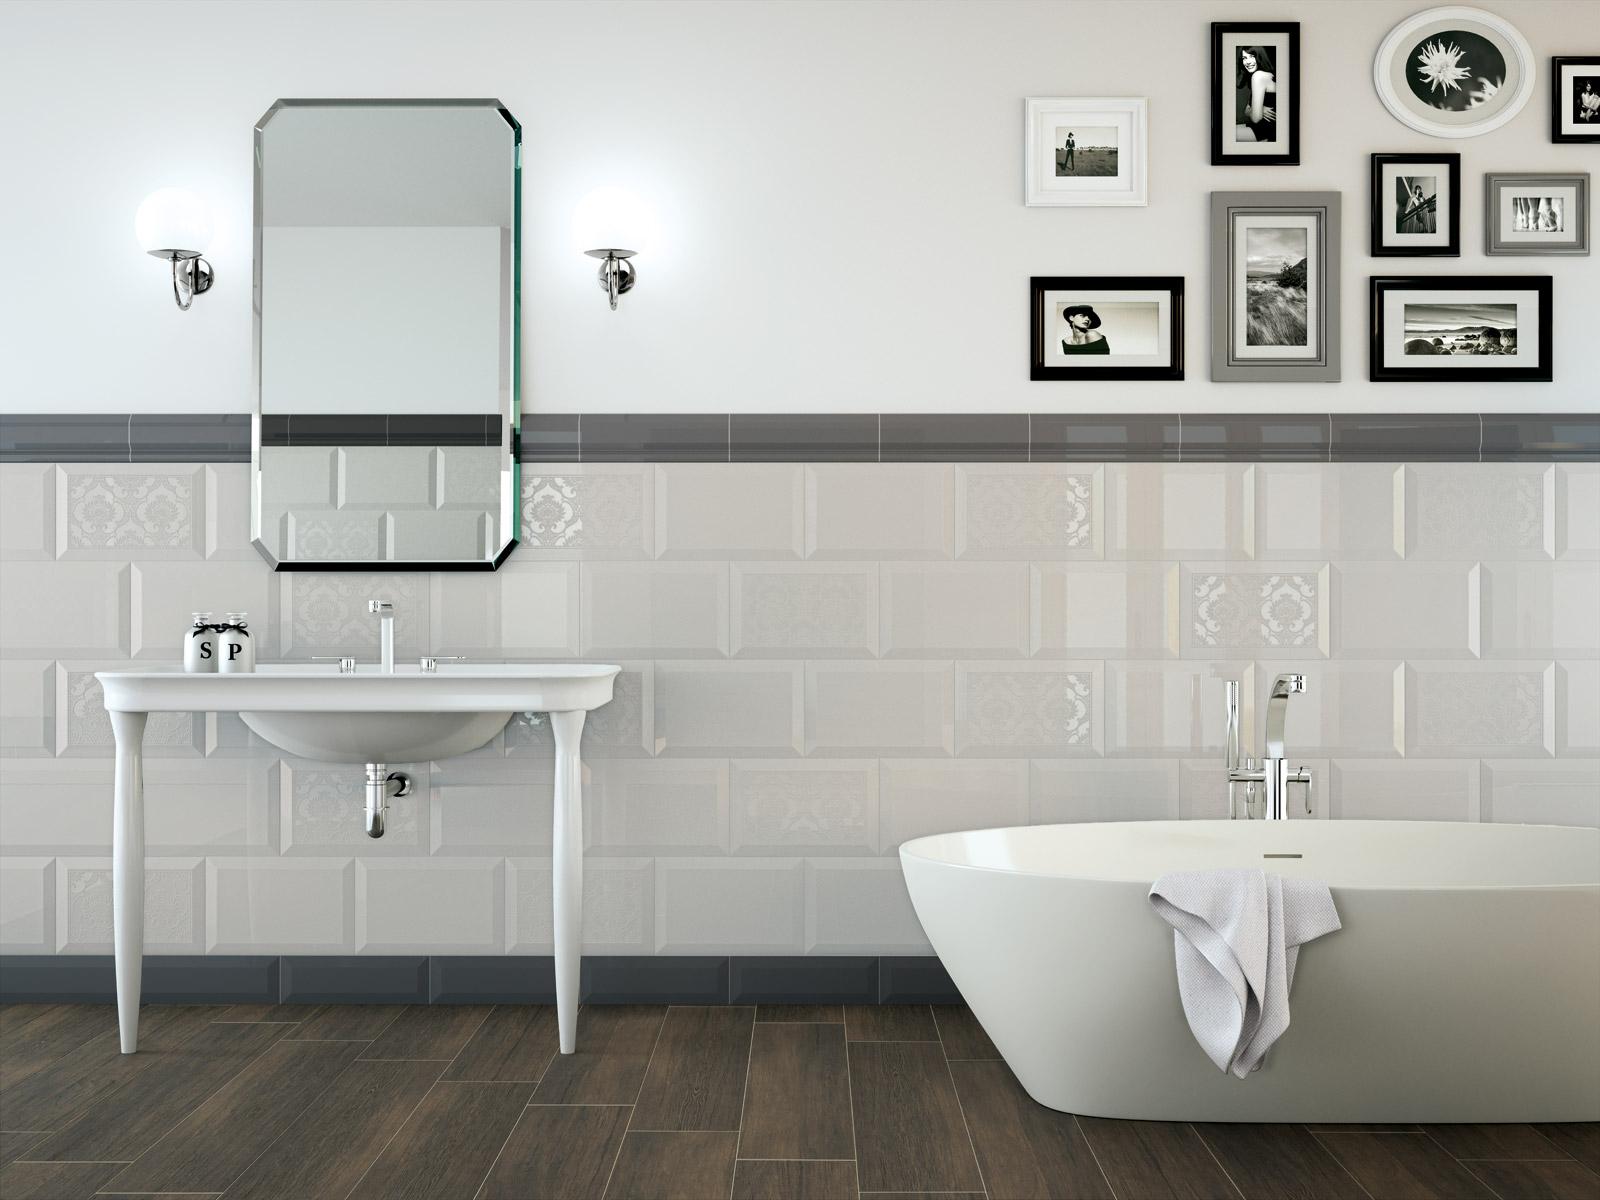 Bathroom Tiles Oxford oxford - polished porcelain stoneware | marazzi